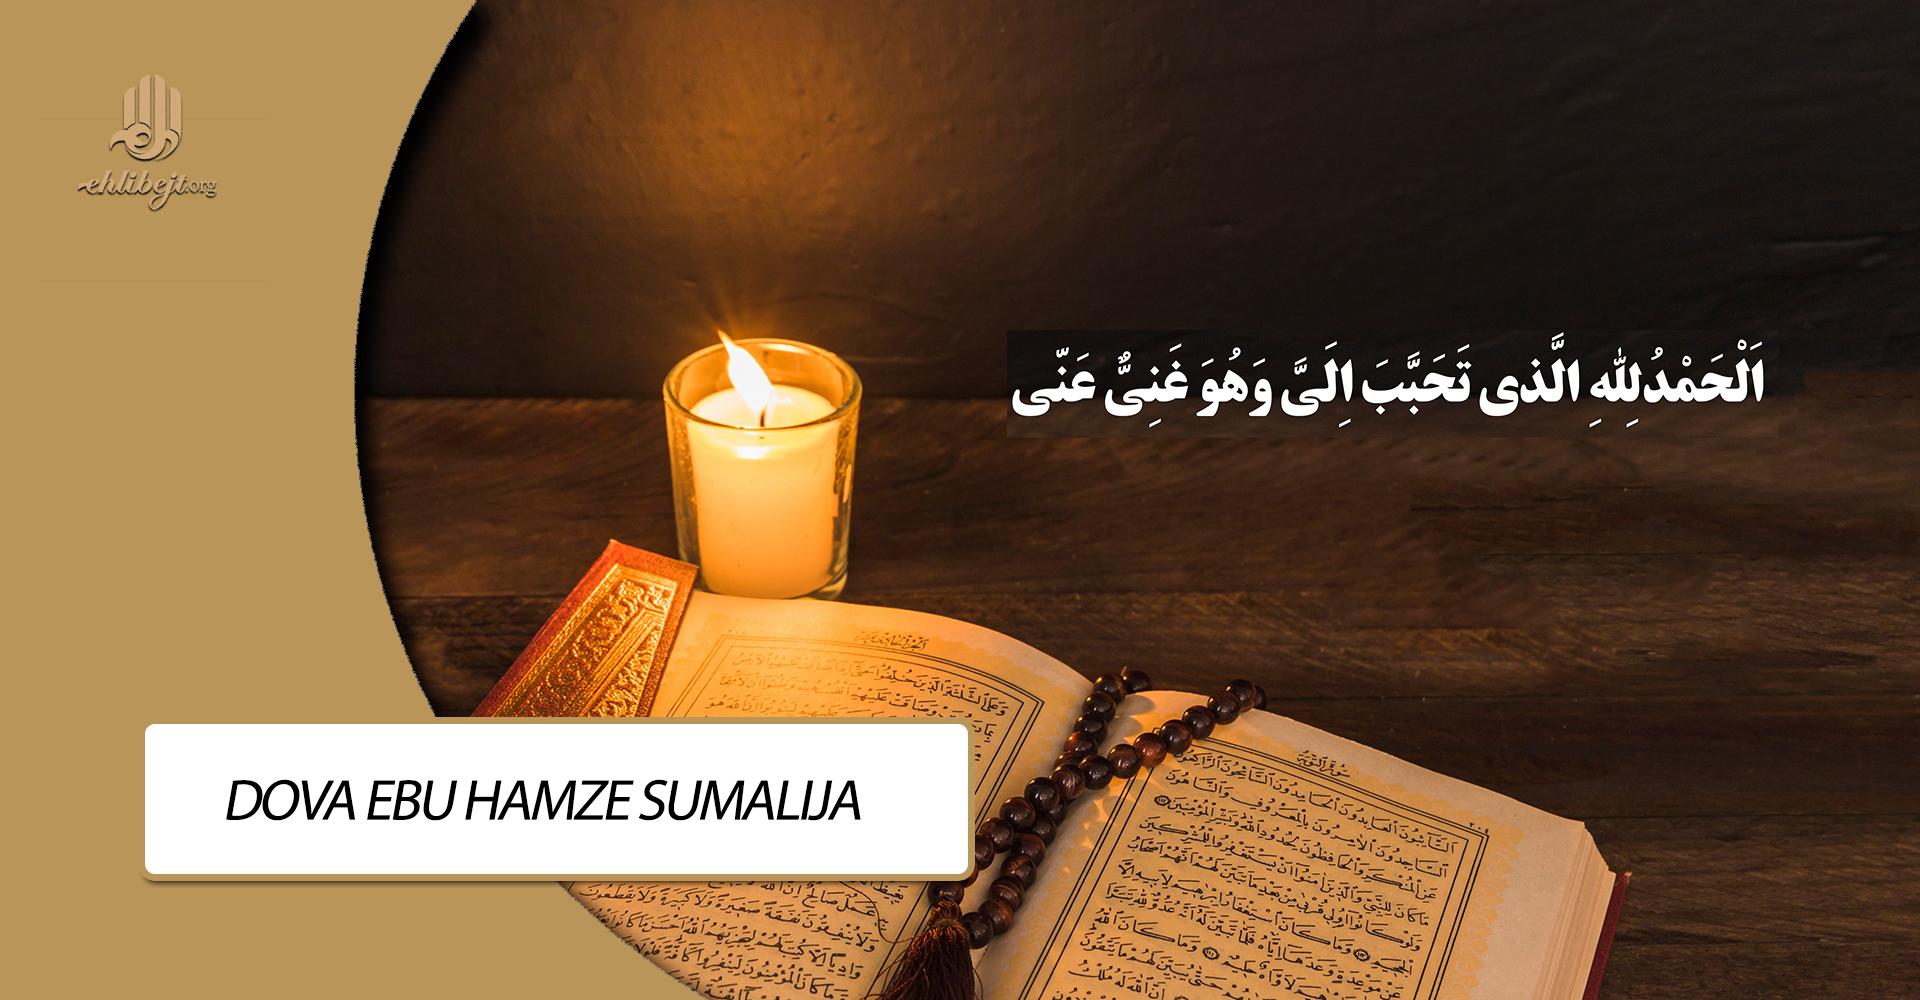 Dova Ebu Hamze Sumalija